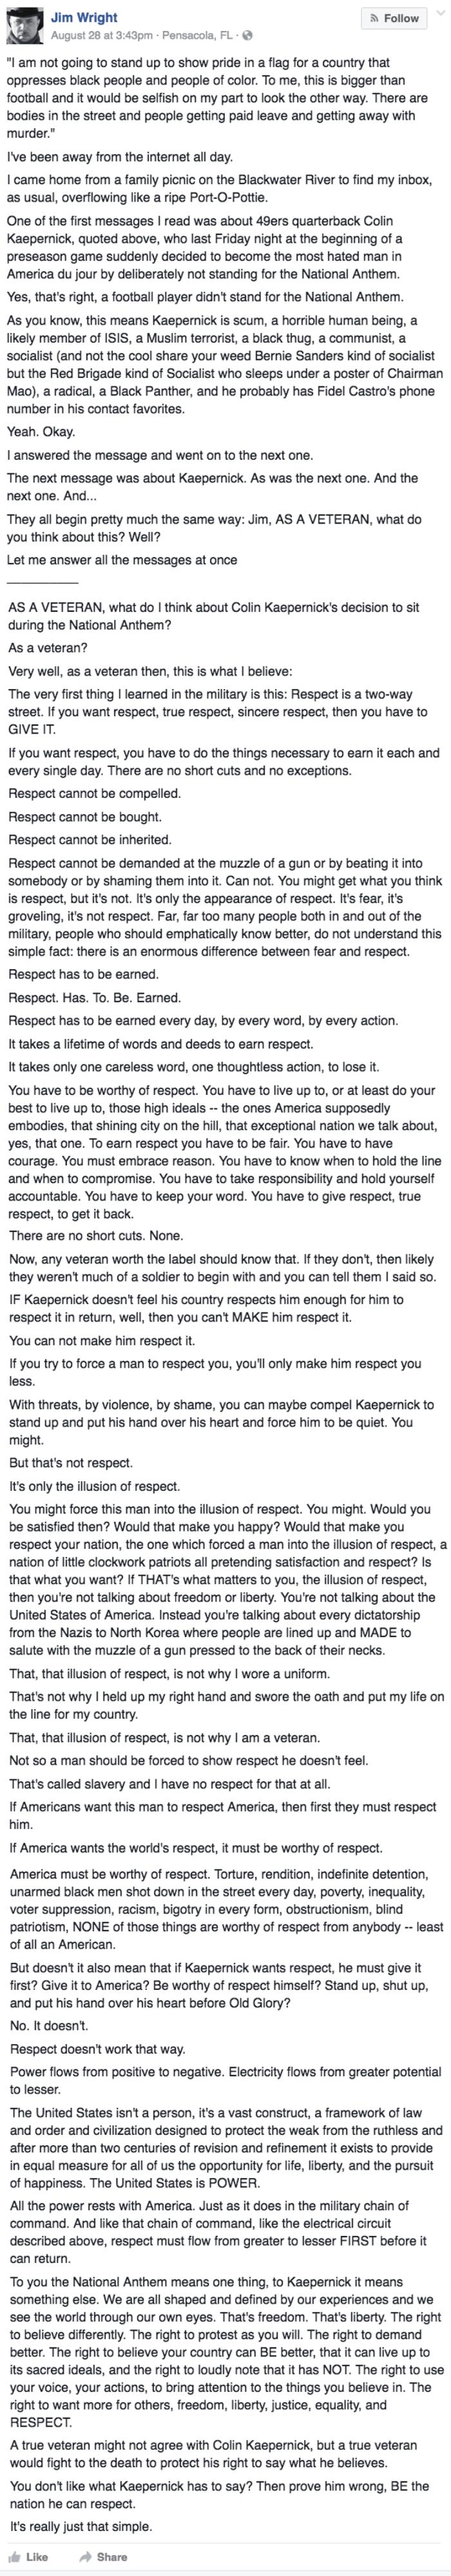 win Veteran Jim Wright responds to Colin Kaepernick's refusal to stand on facebook